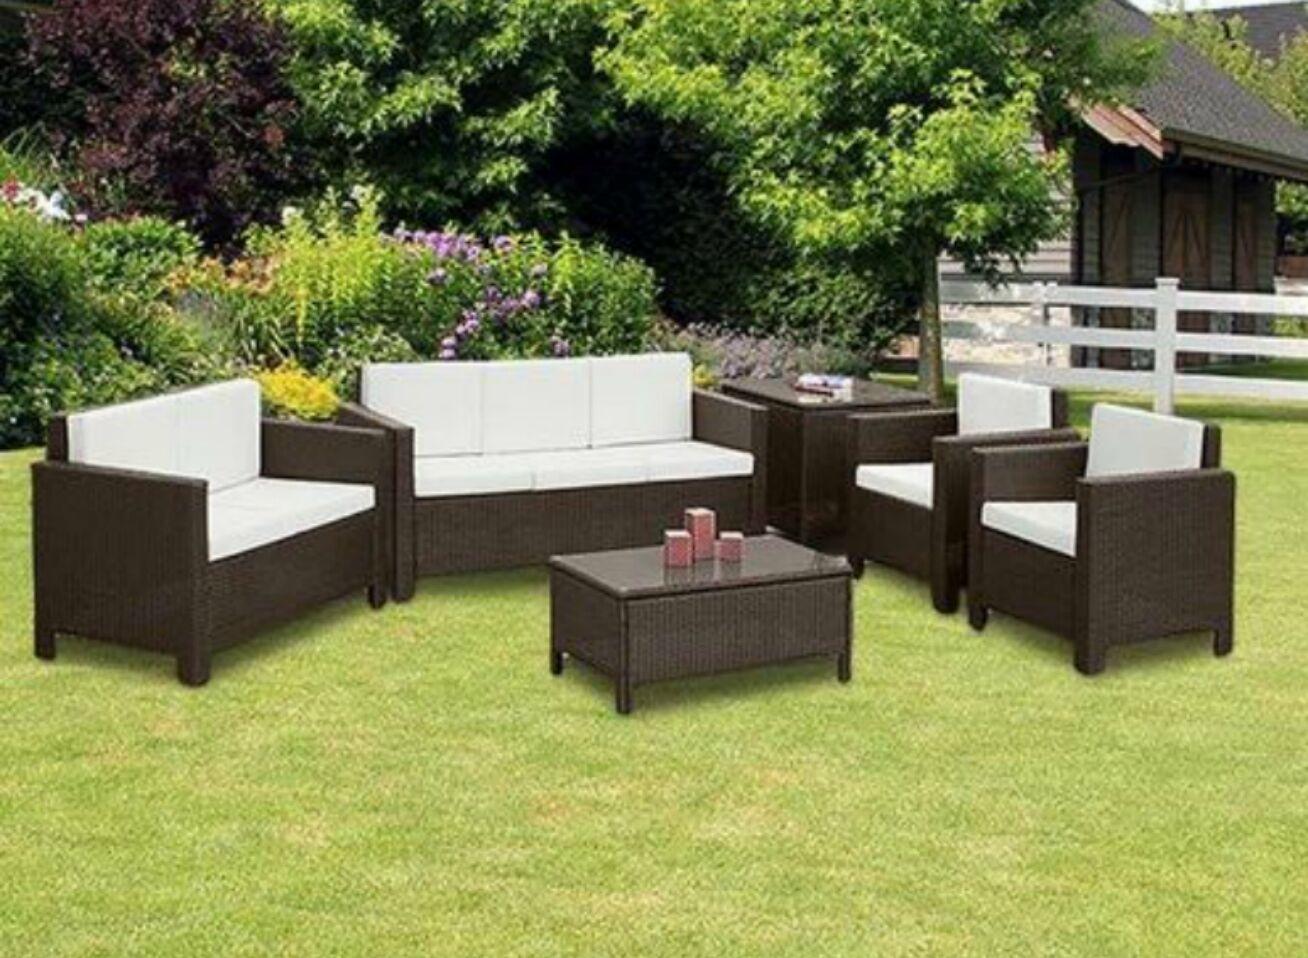 Garden Furniture - RATTAN GARDEN FURNITURE SET SOFA CHAIRS TABLE CONSERVATORY OUTDOOR PATIO